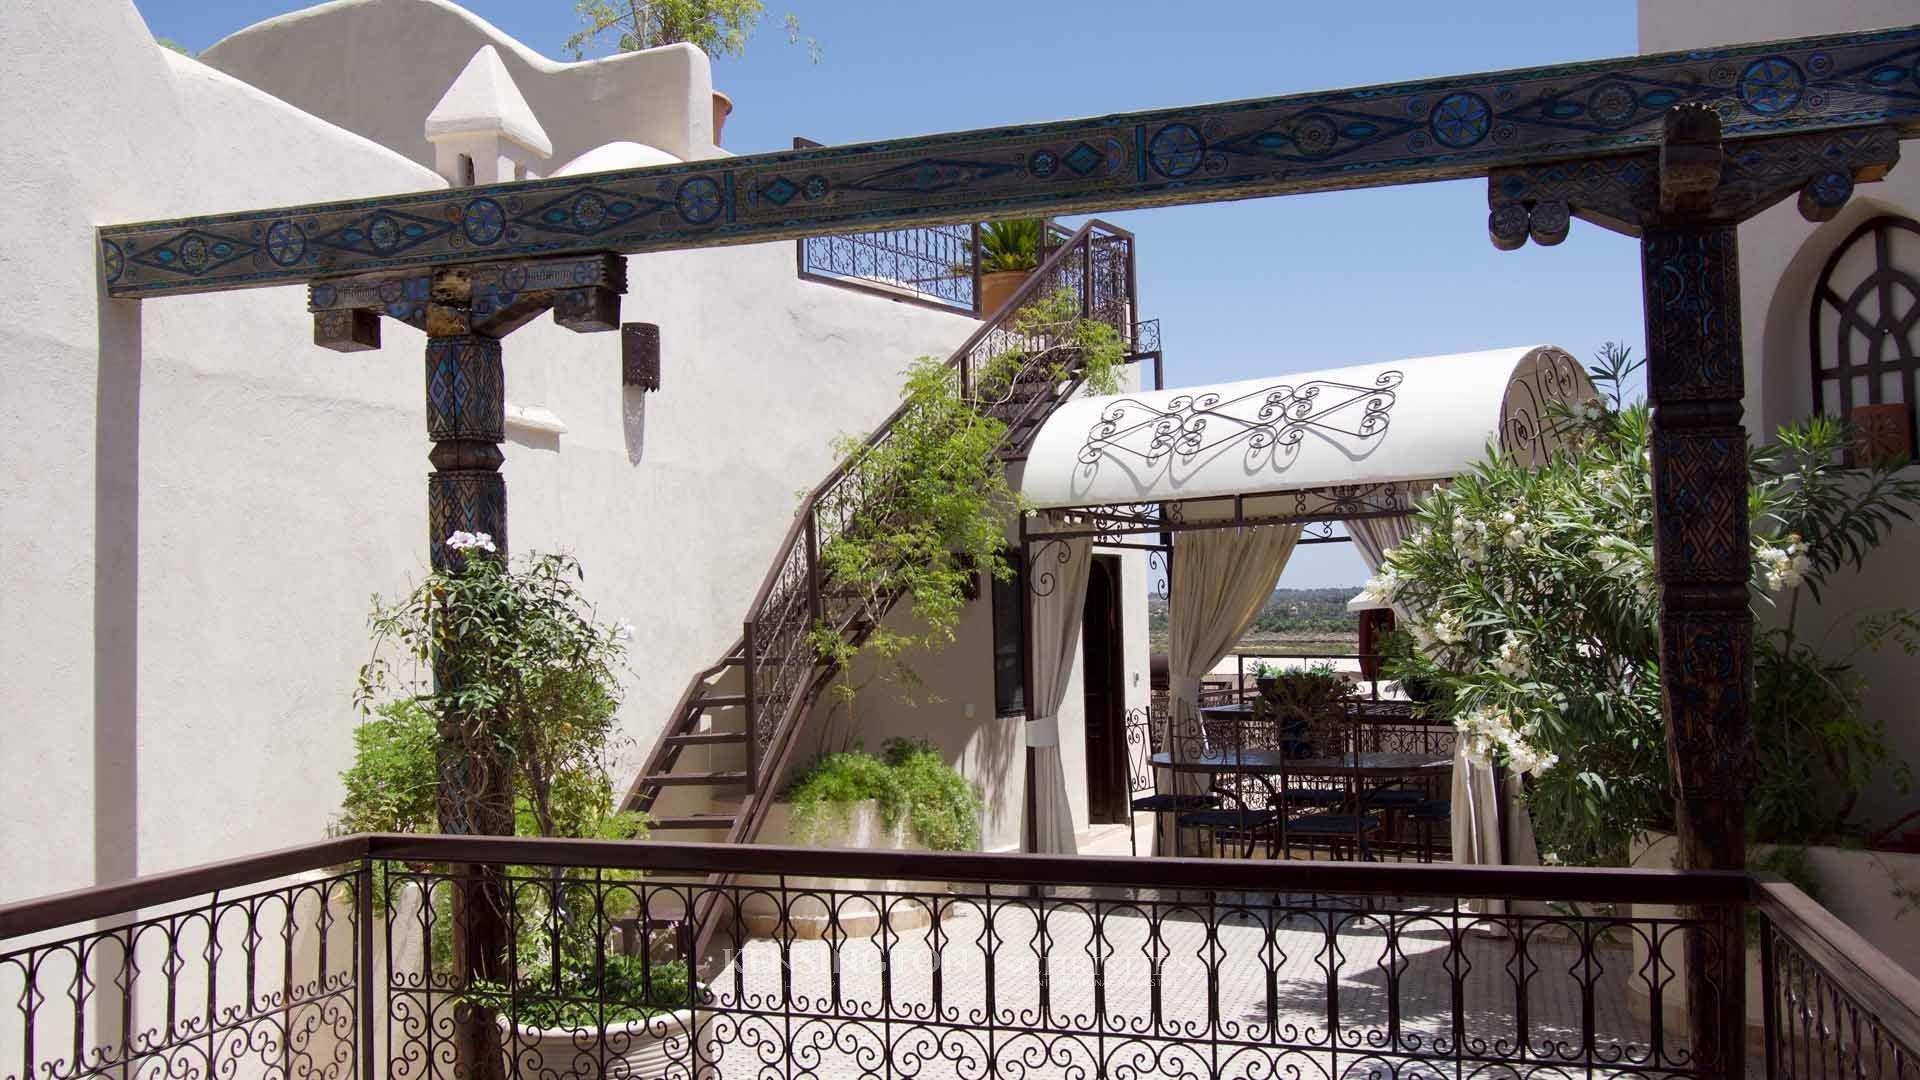 KPPM01331: Riad Vista Riad Marrakech Morocco